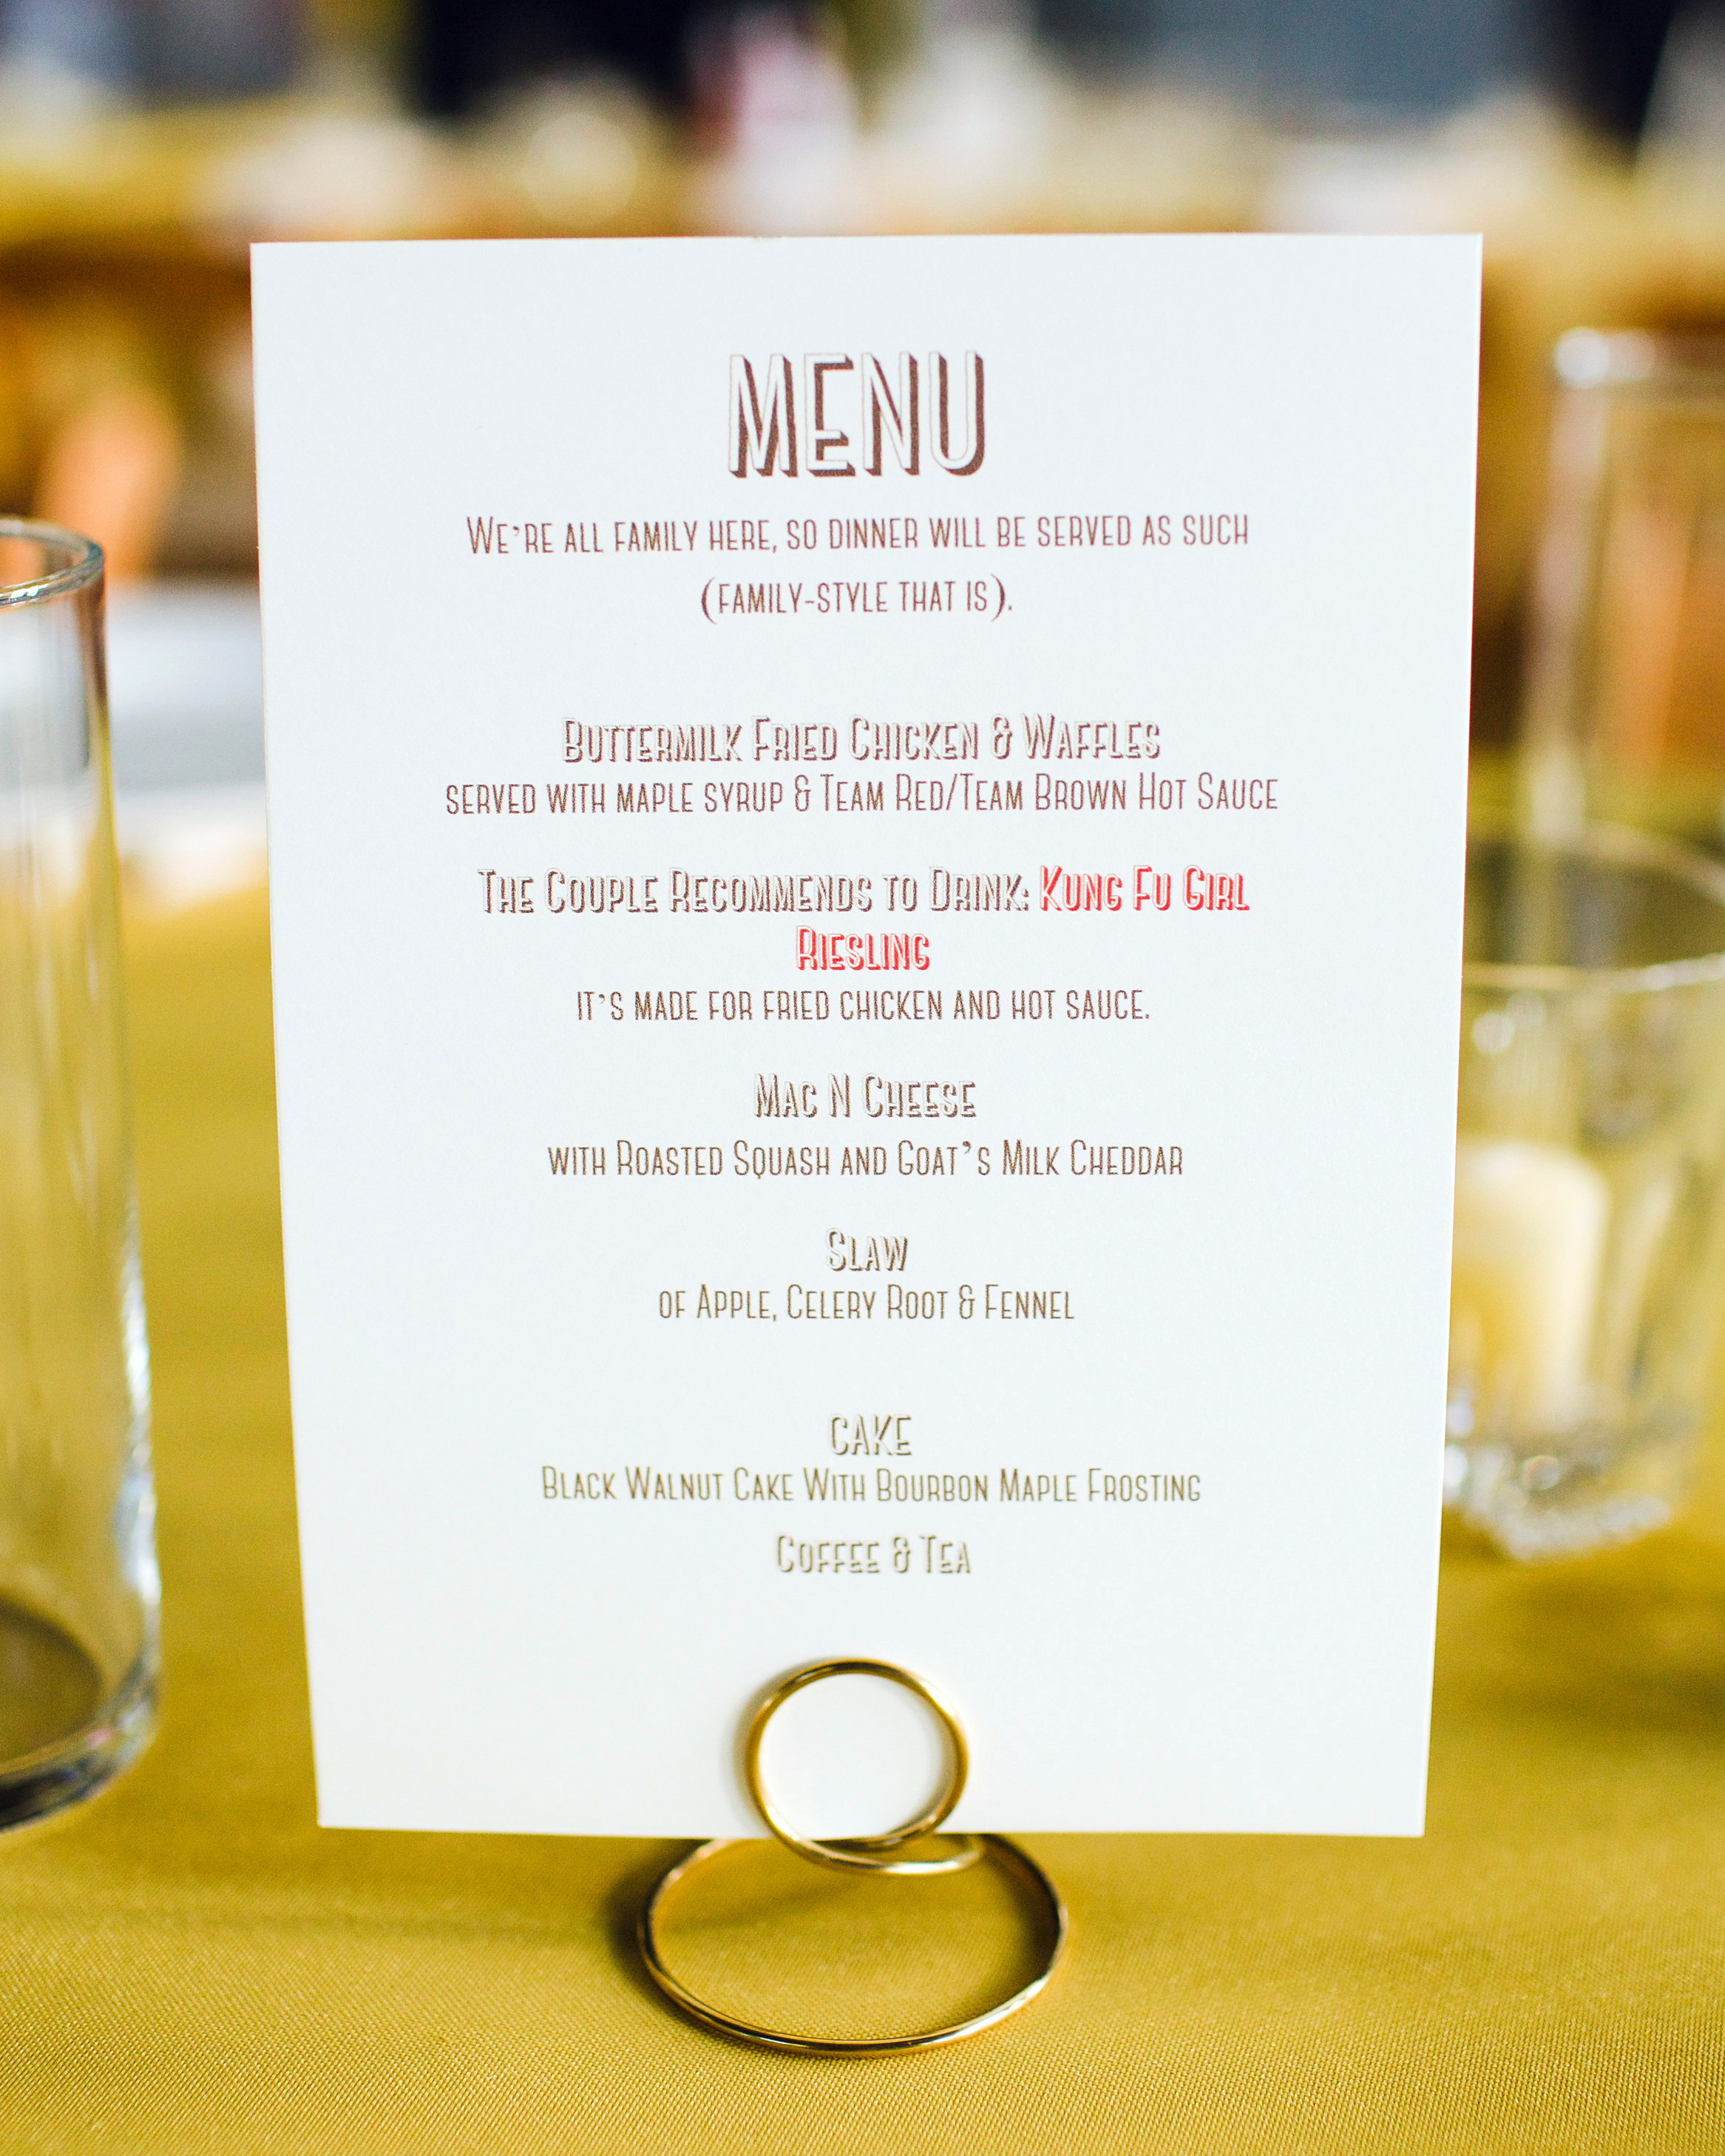 lauren-jake-wedding-menu-6914-s111838-0315.jpg